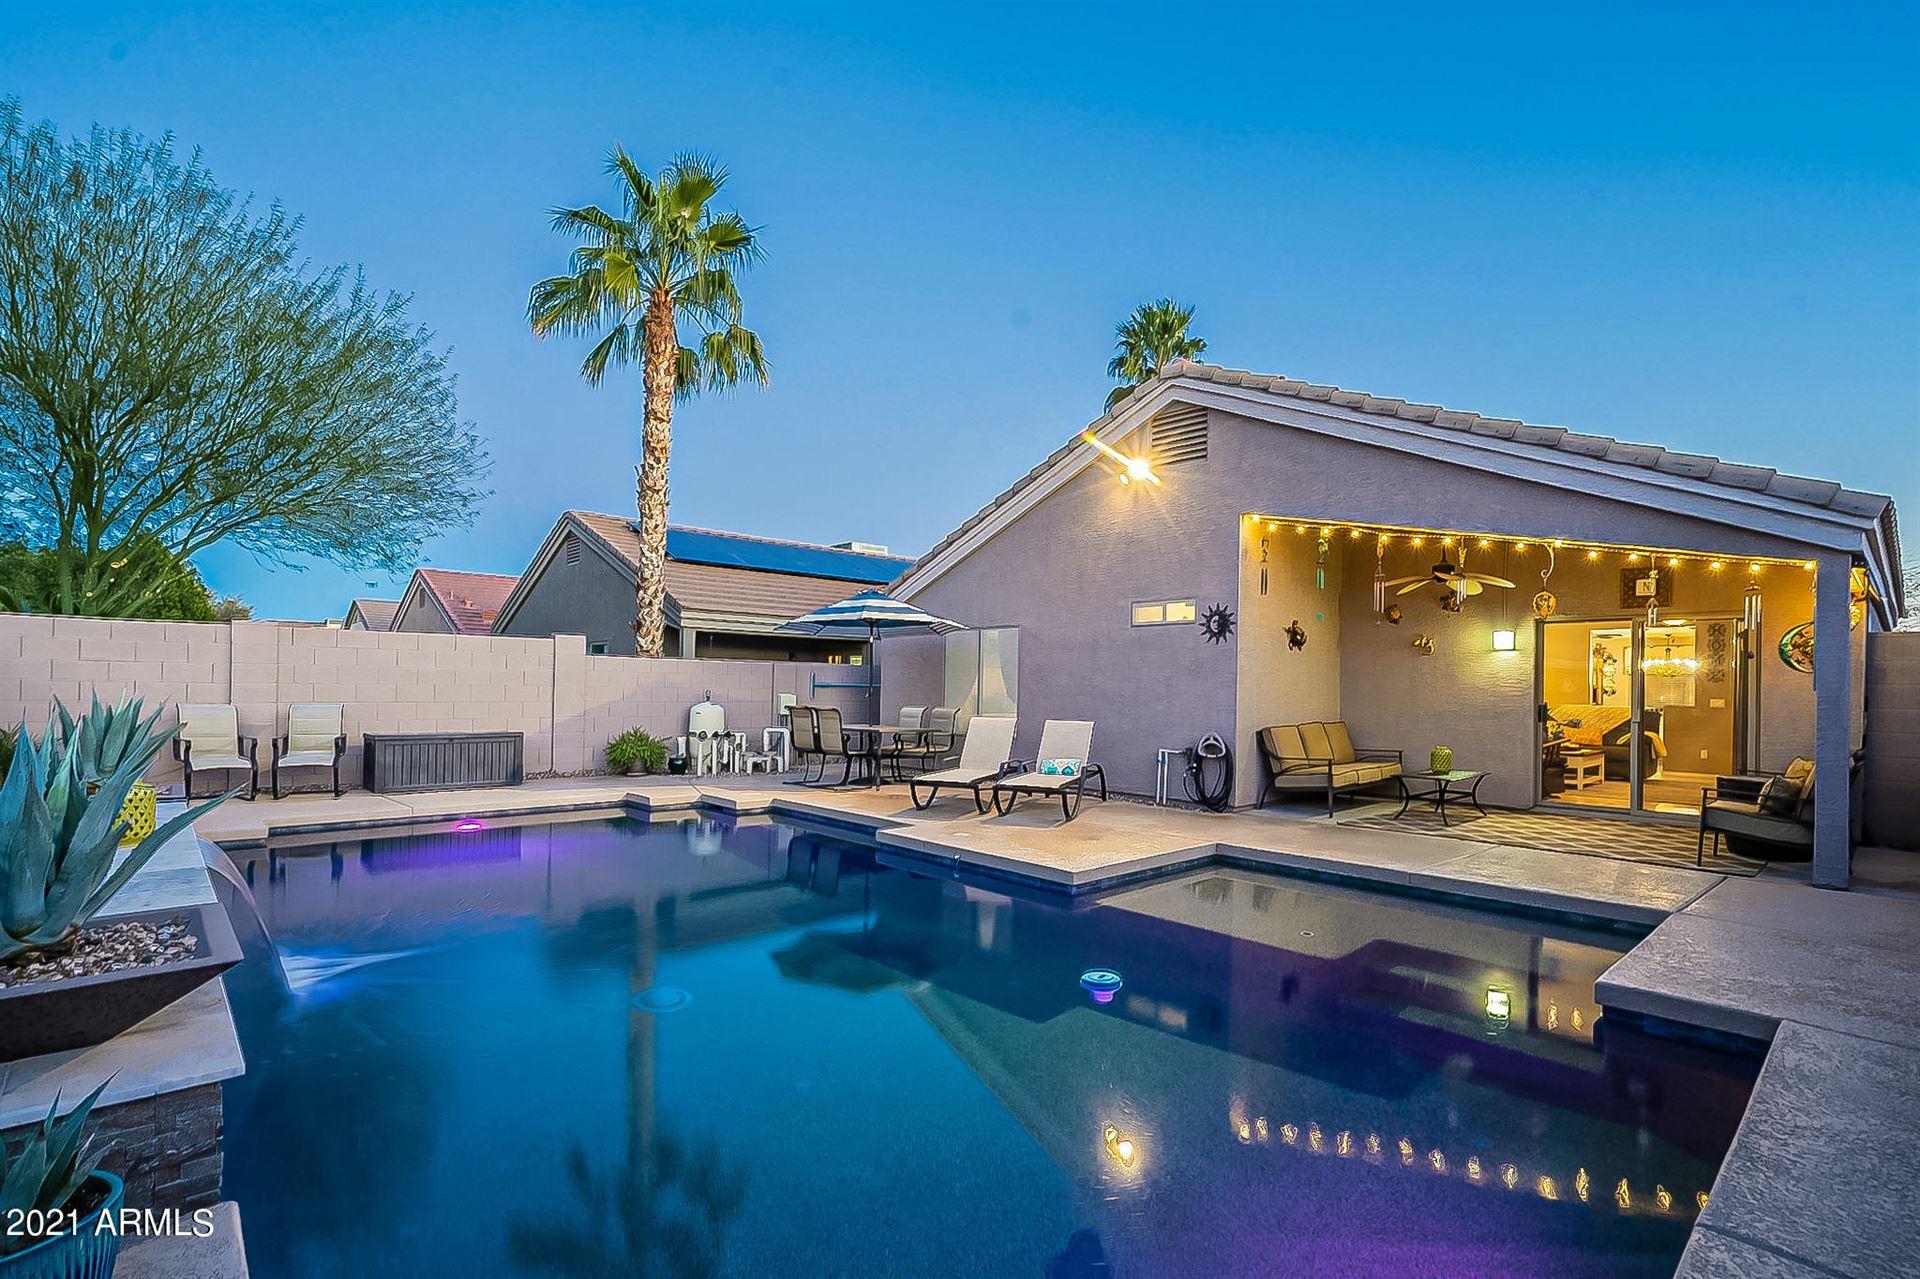 Photo of 13022 W REDFIELD Road, El Mirage, AZ 85335 (MLS # 6199348)